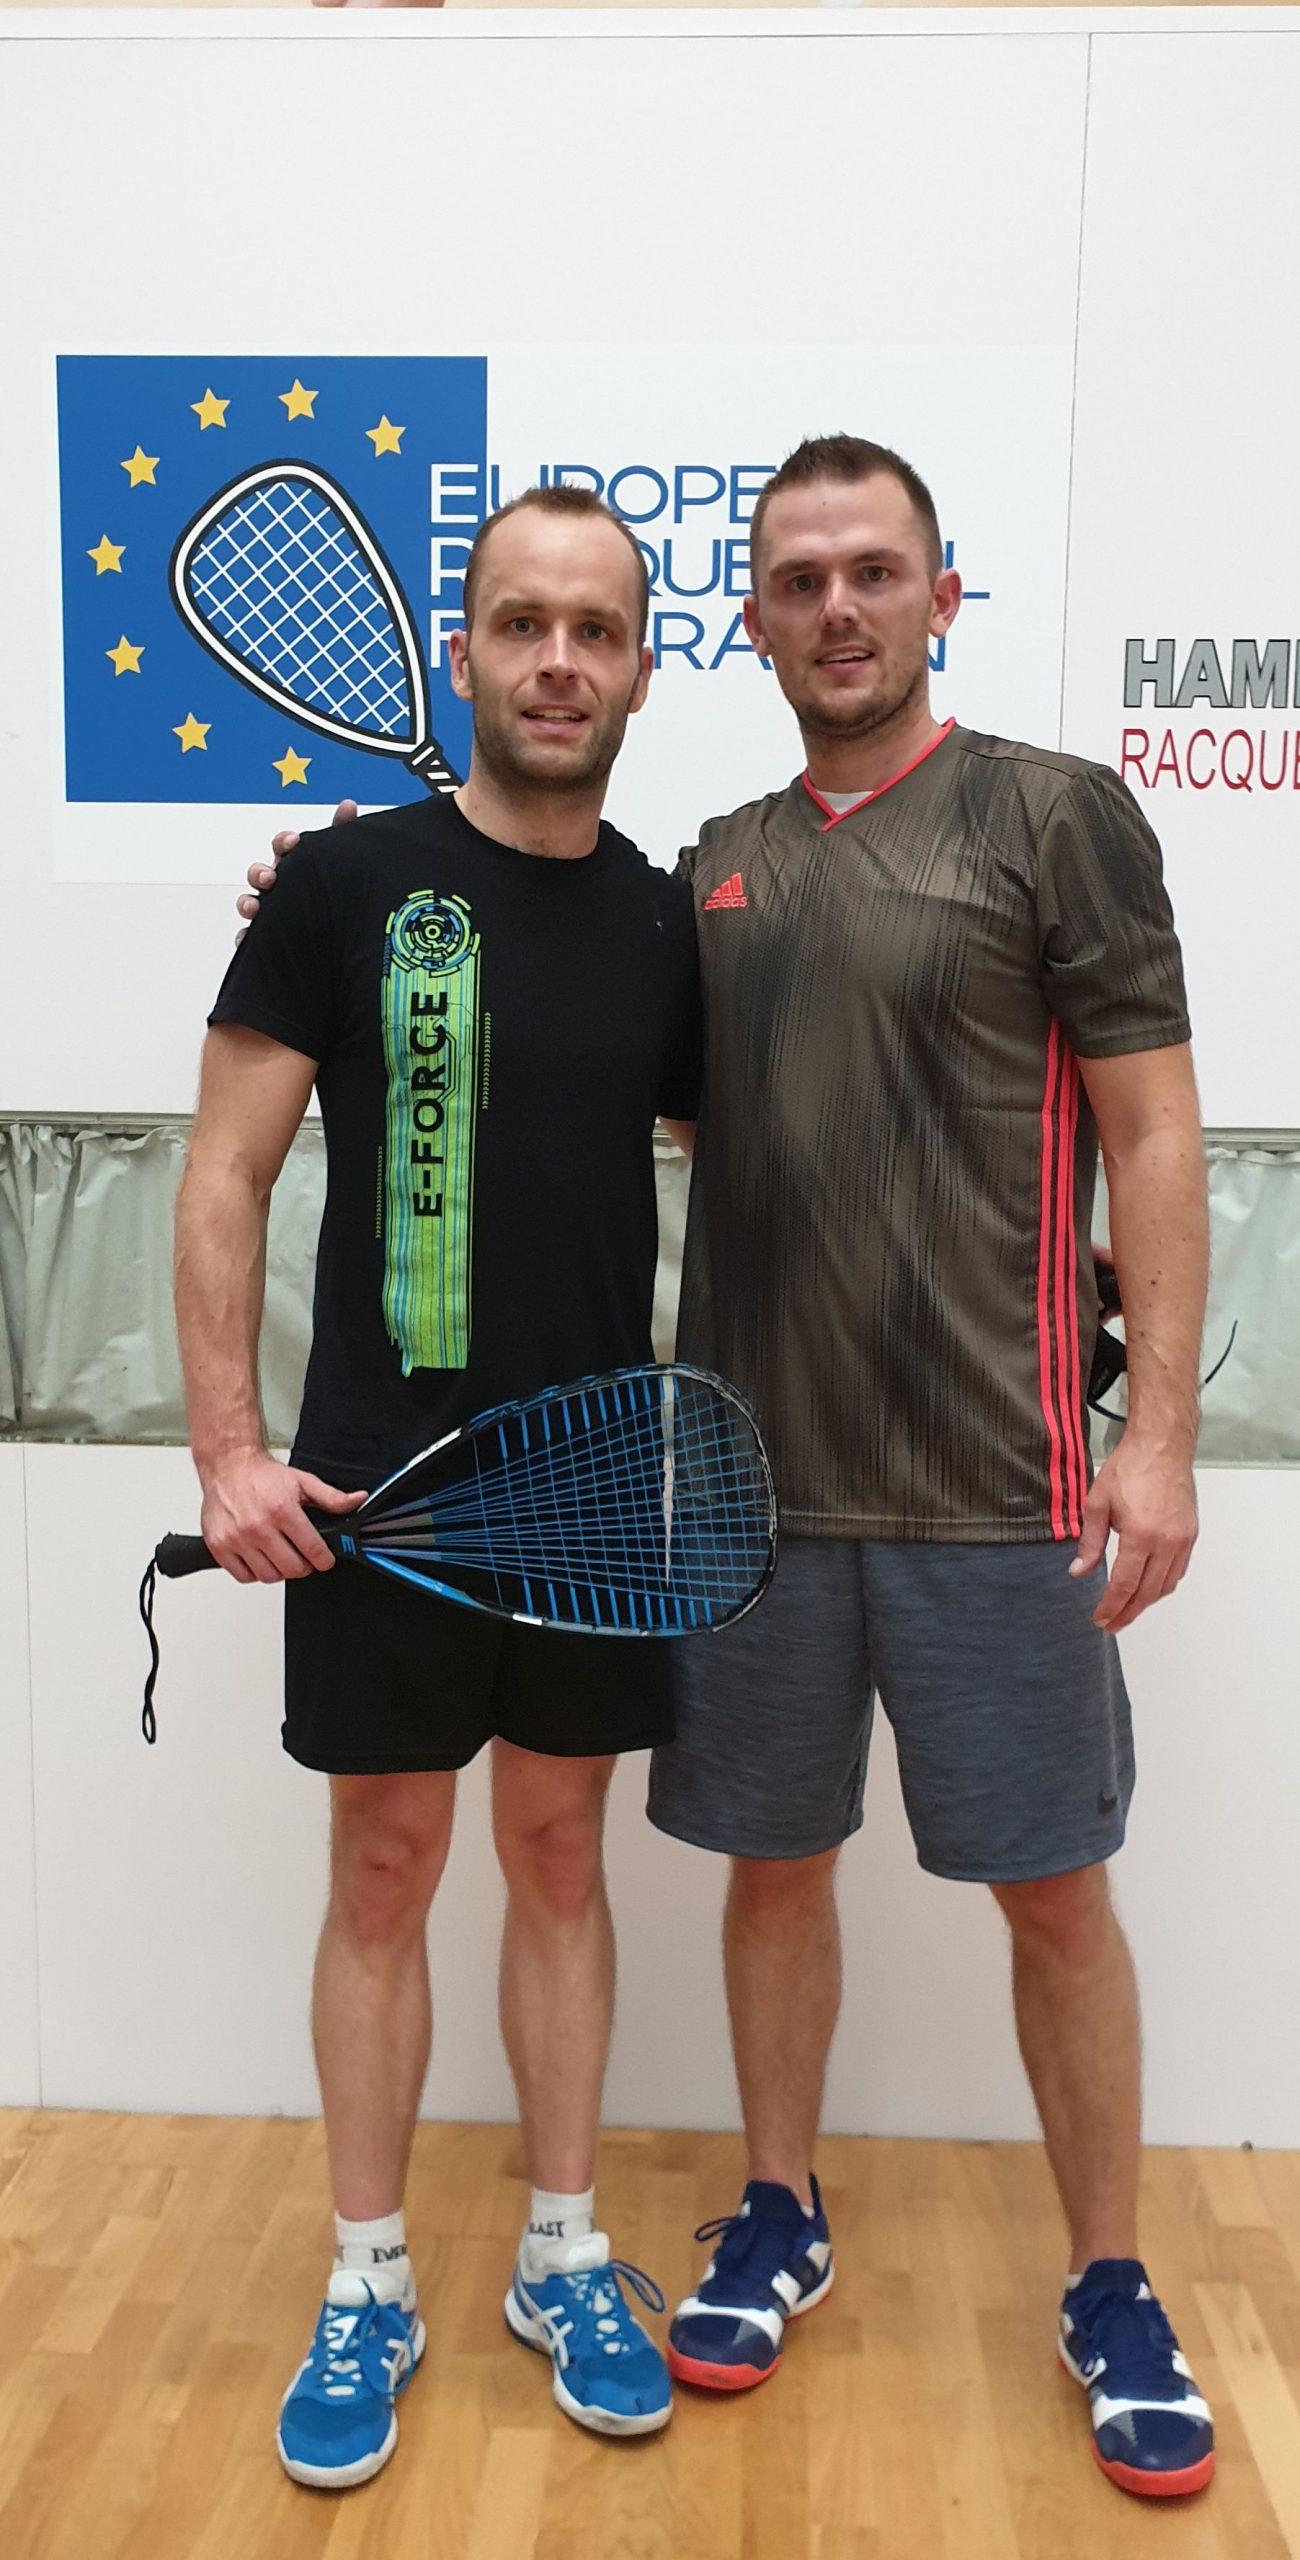 Marcel Czempisz ist Europameister!